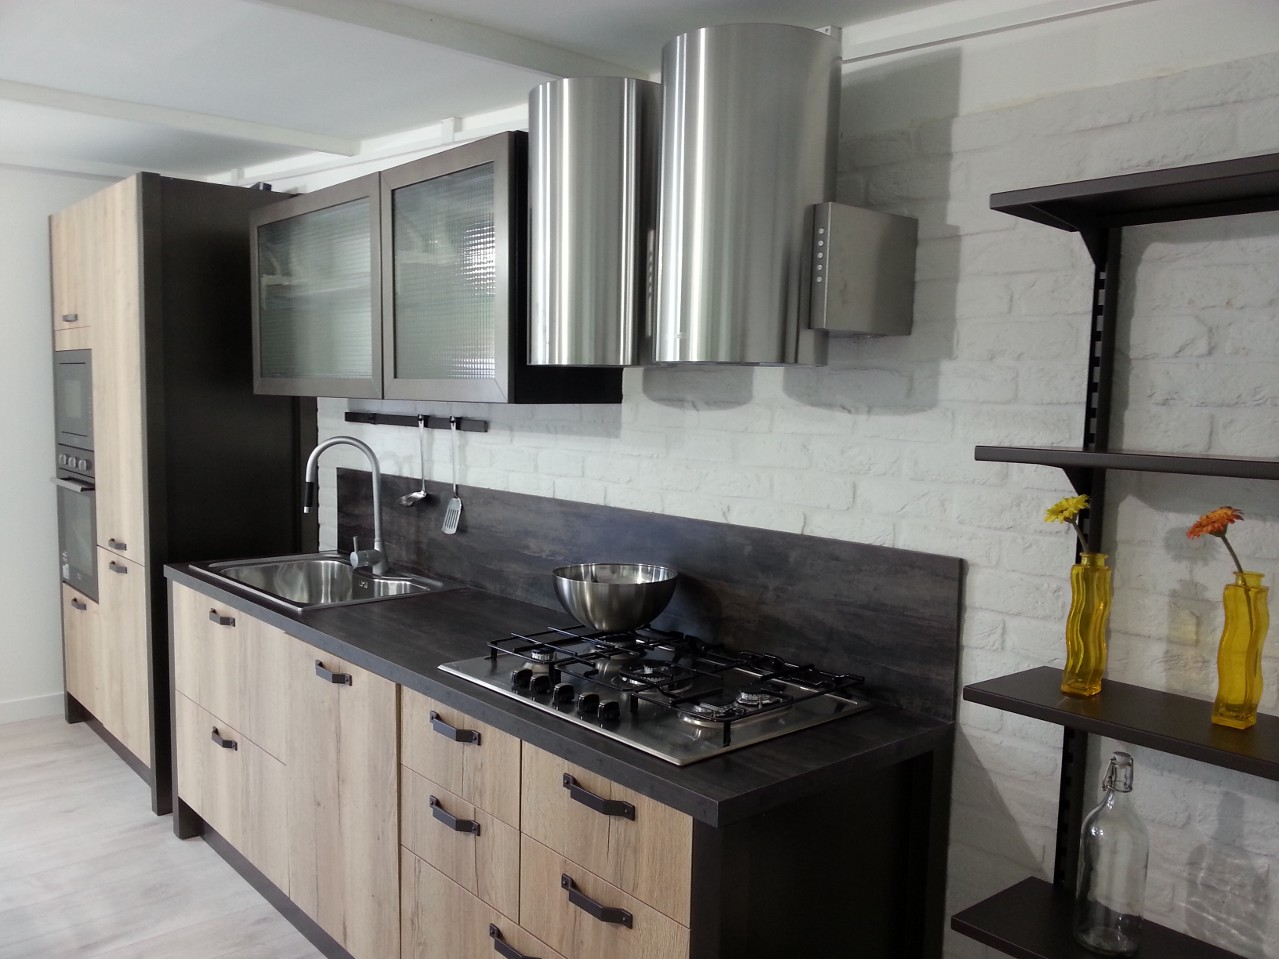 Cucina mattone b trep rm 8 rinnovare con la pietra - Rivestimento cucina finta pietra ...